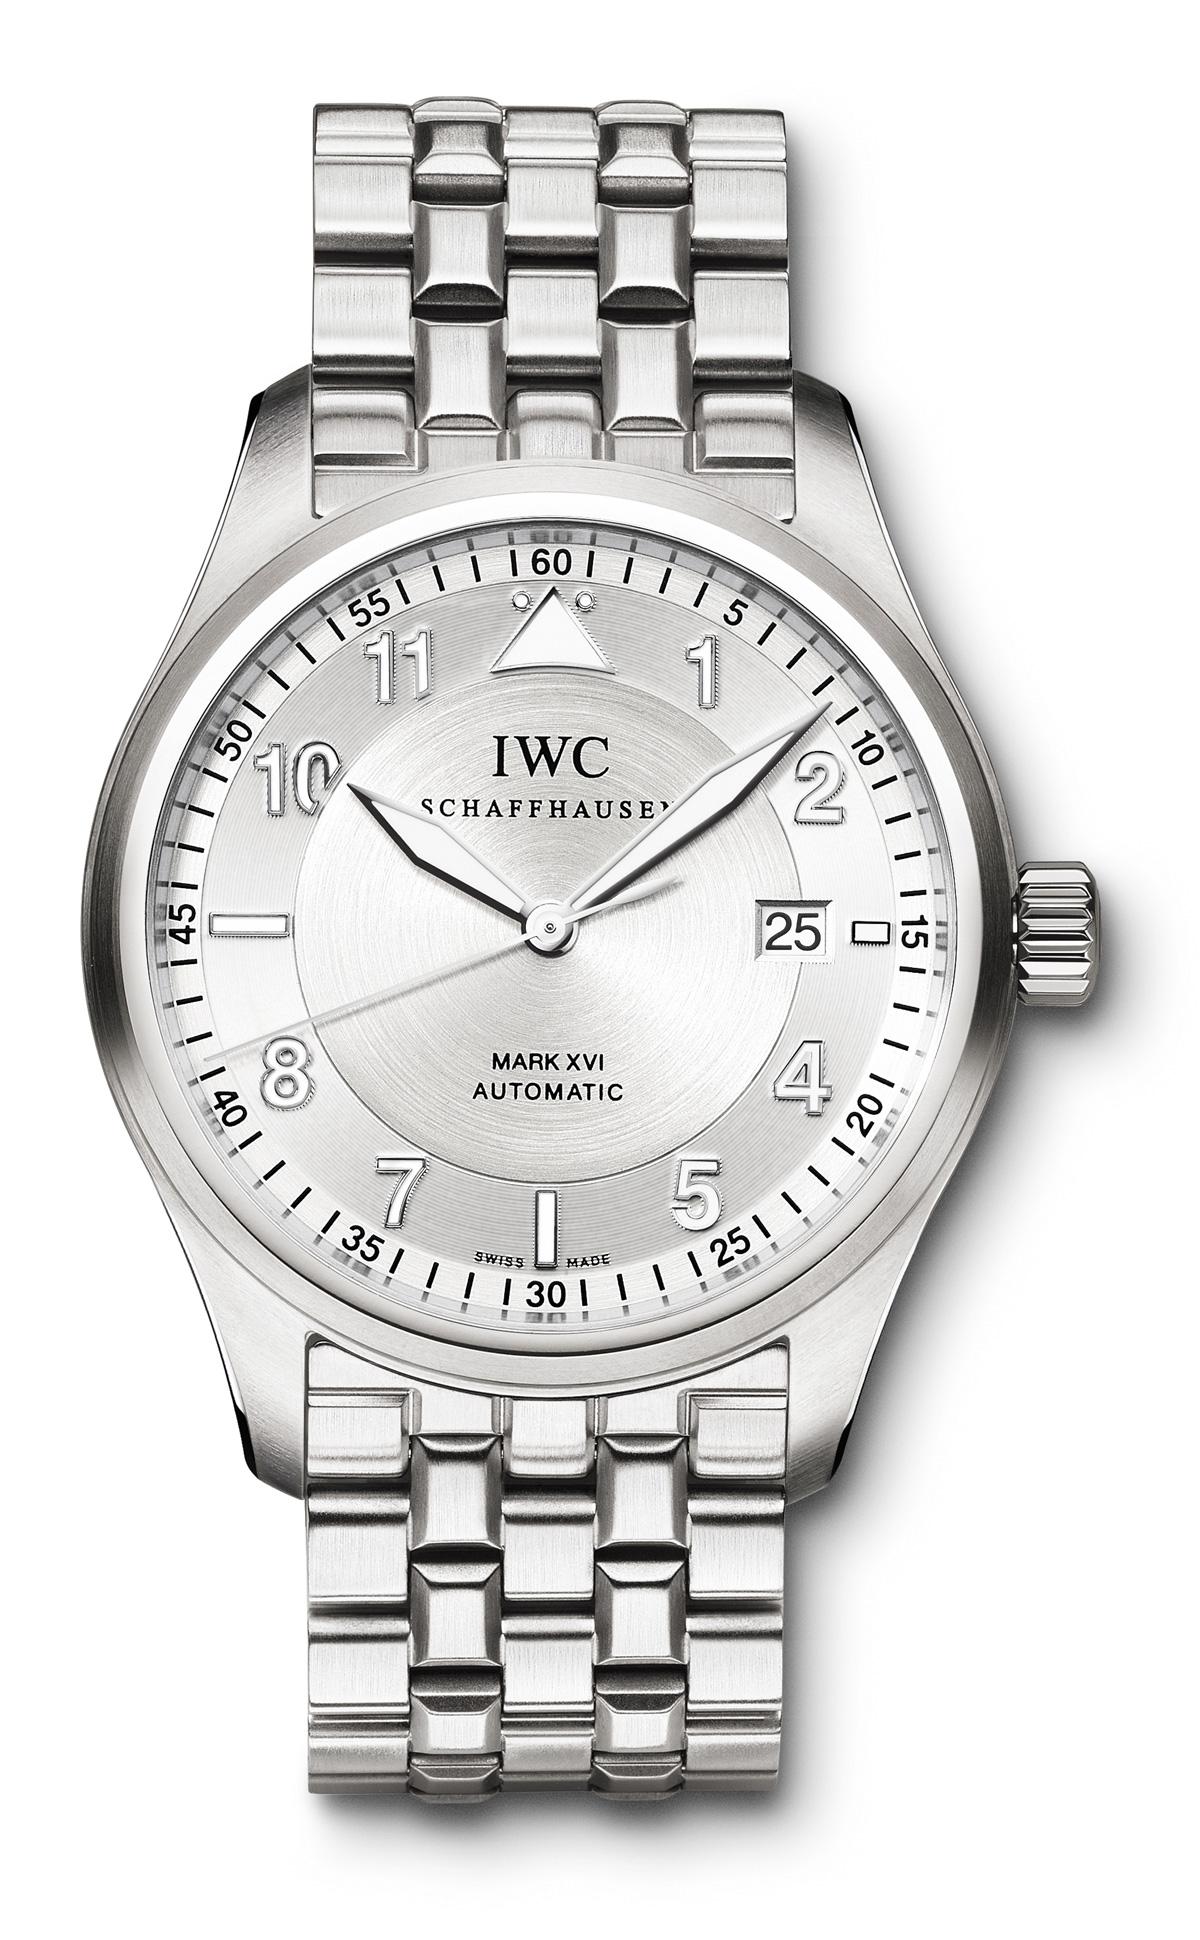 IWC Pilots Watches Spitfire Mark 16 Replica